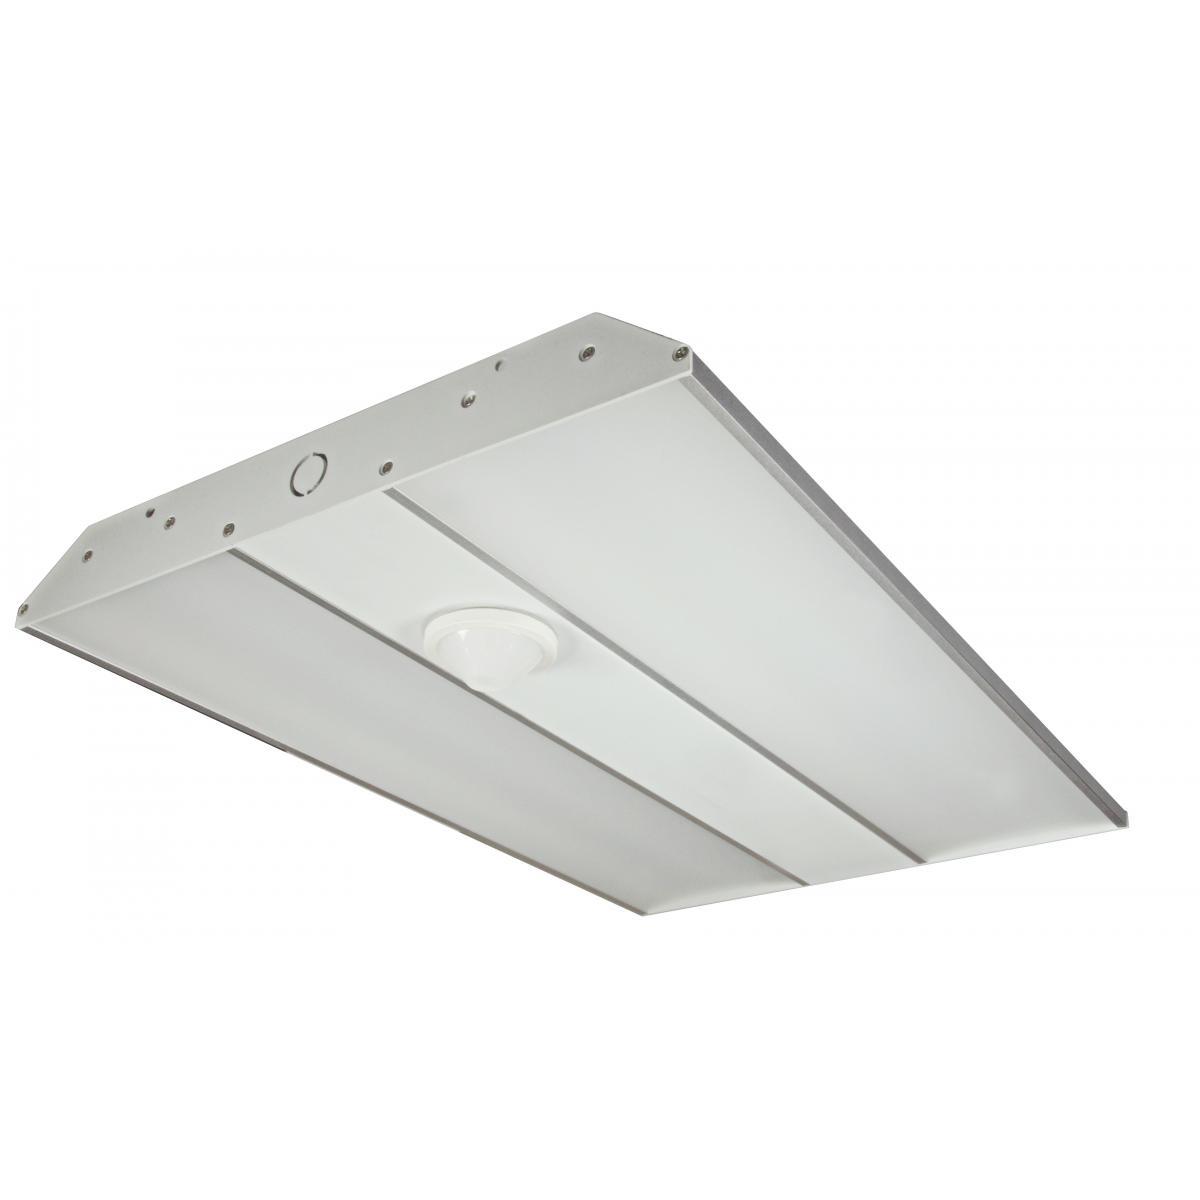 62-1074 210W LED 4 FT. LINEAR HI-BAY